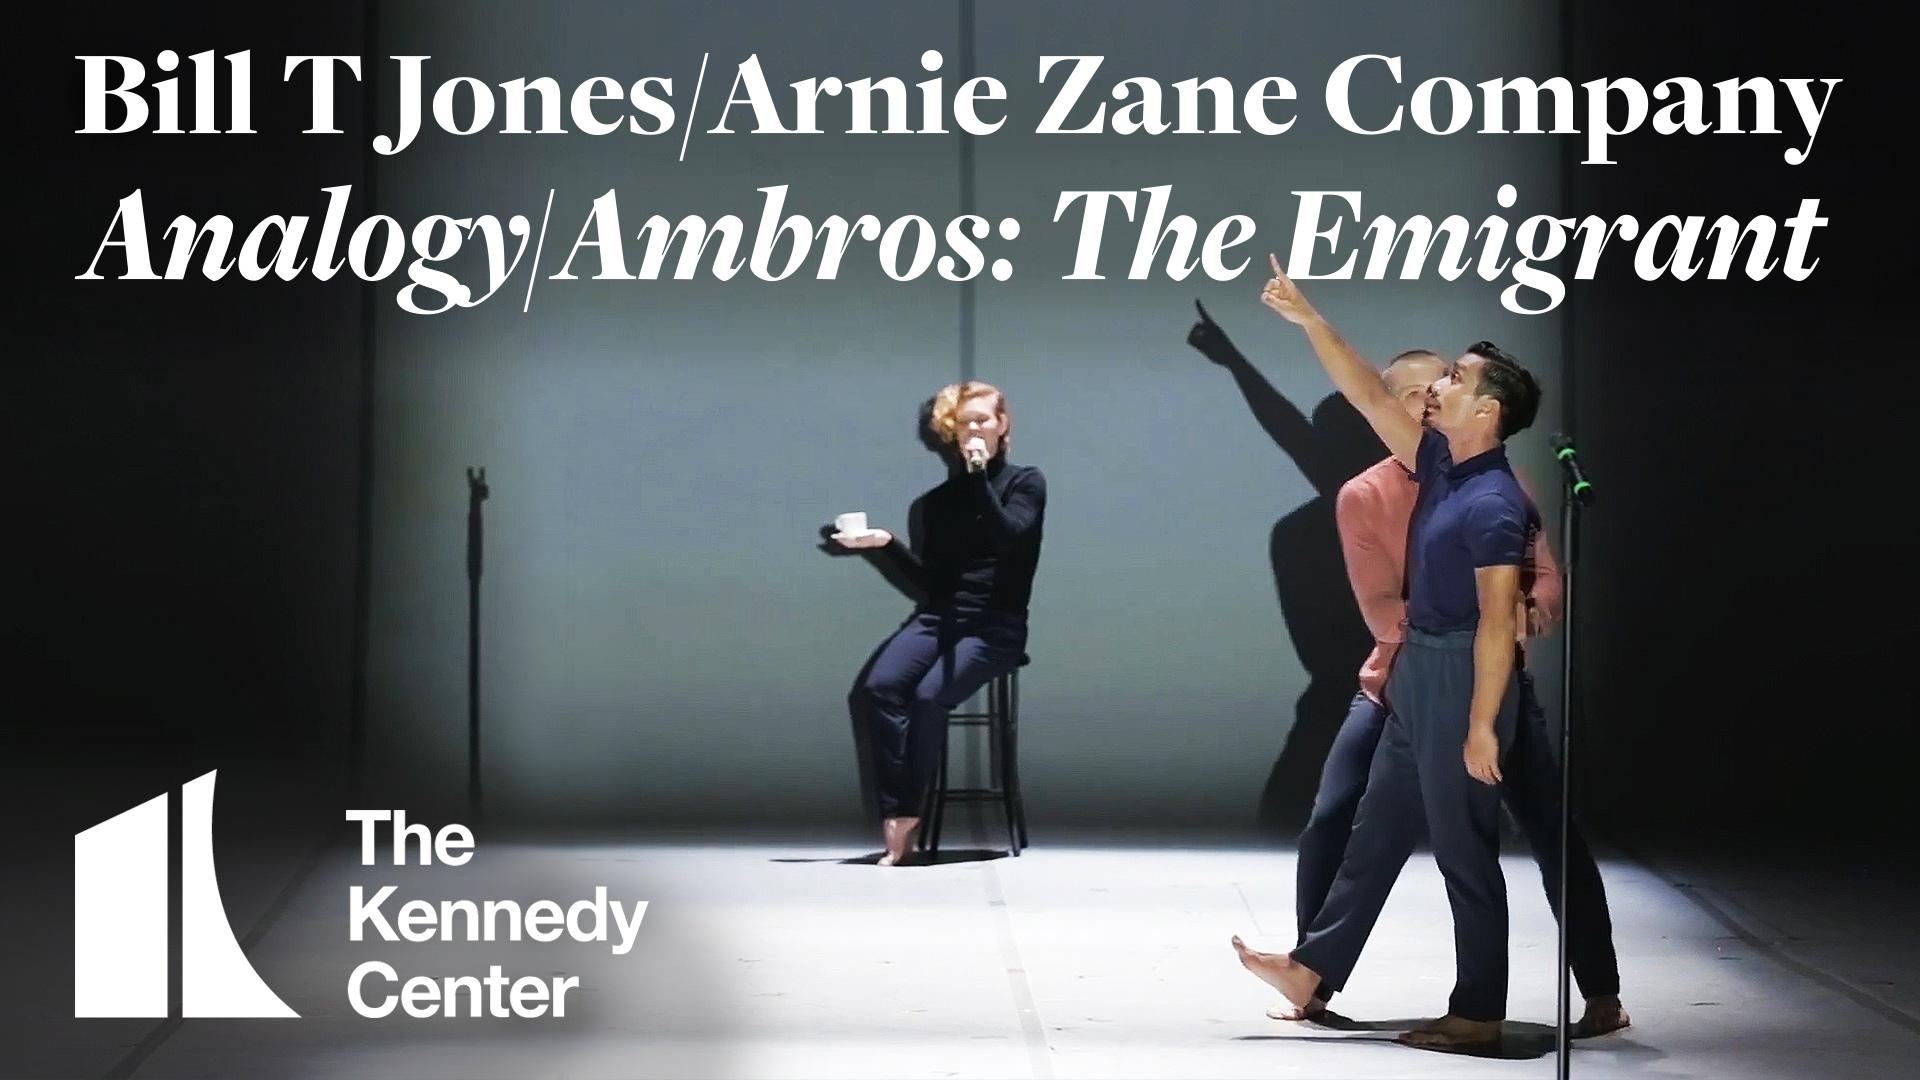 Bill T. Jones/Arnie Zane Company: Analogy/Ambros: The Emigrant | The Kennedy Center